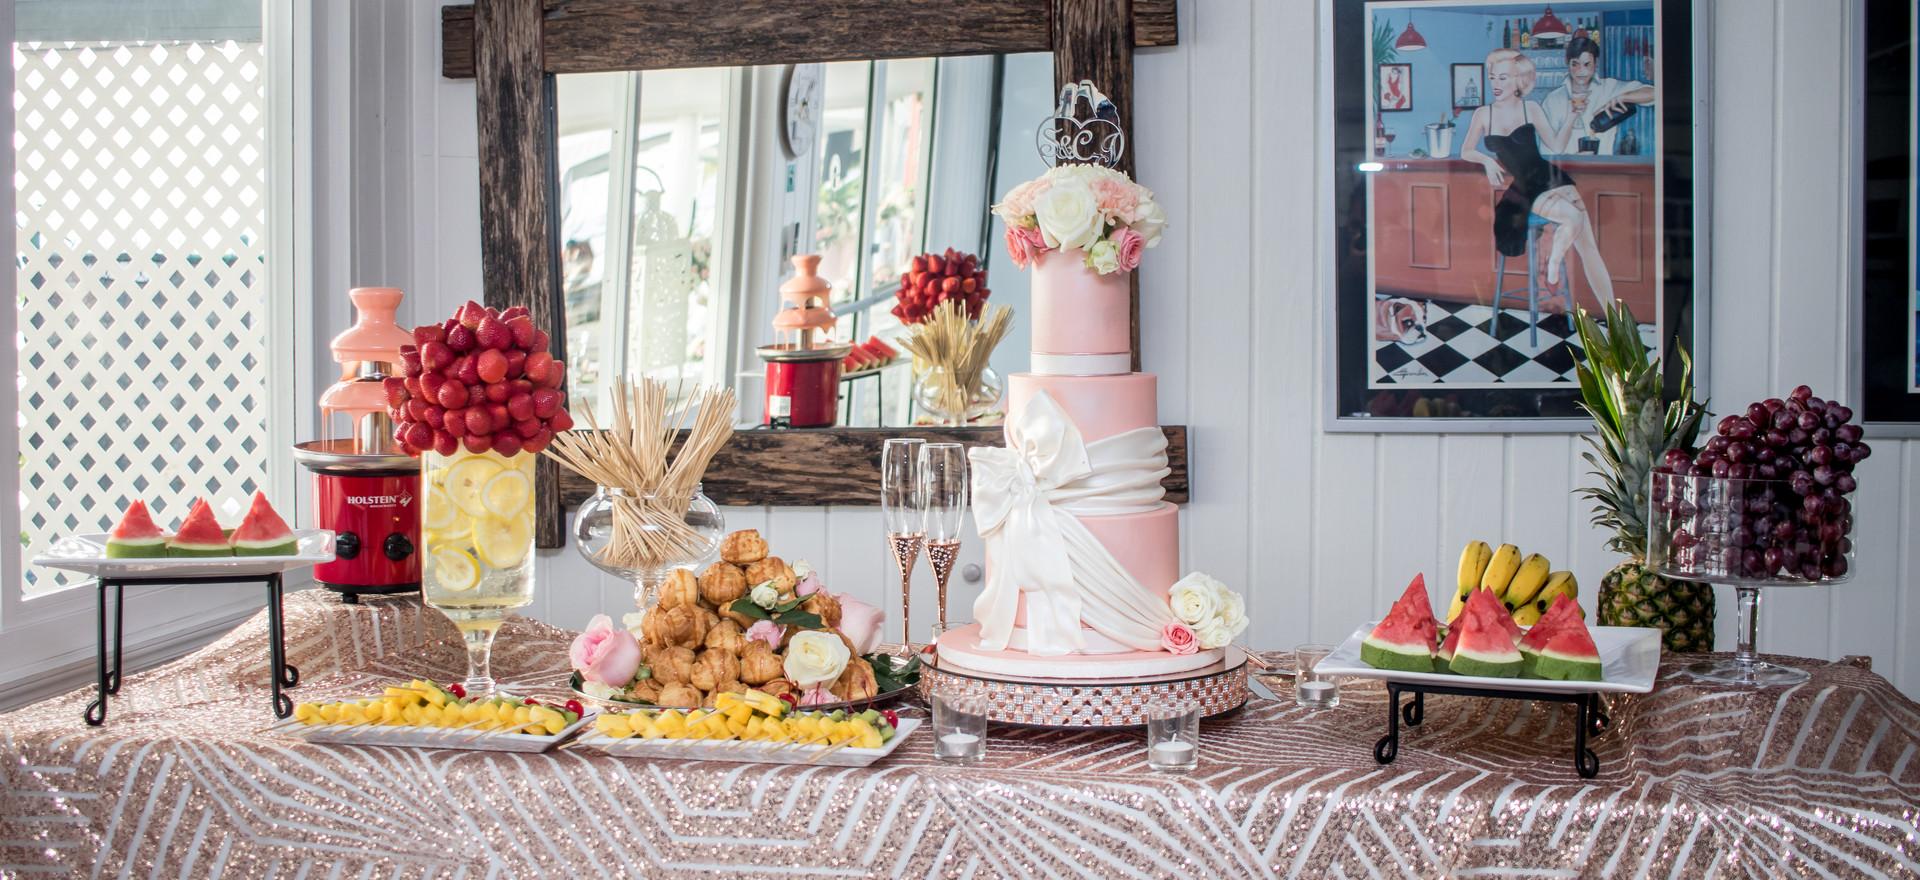 Wedding Bar featuring Three Tier Wedding Cake, Fresh Fruits and Chocolate Fountain.